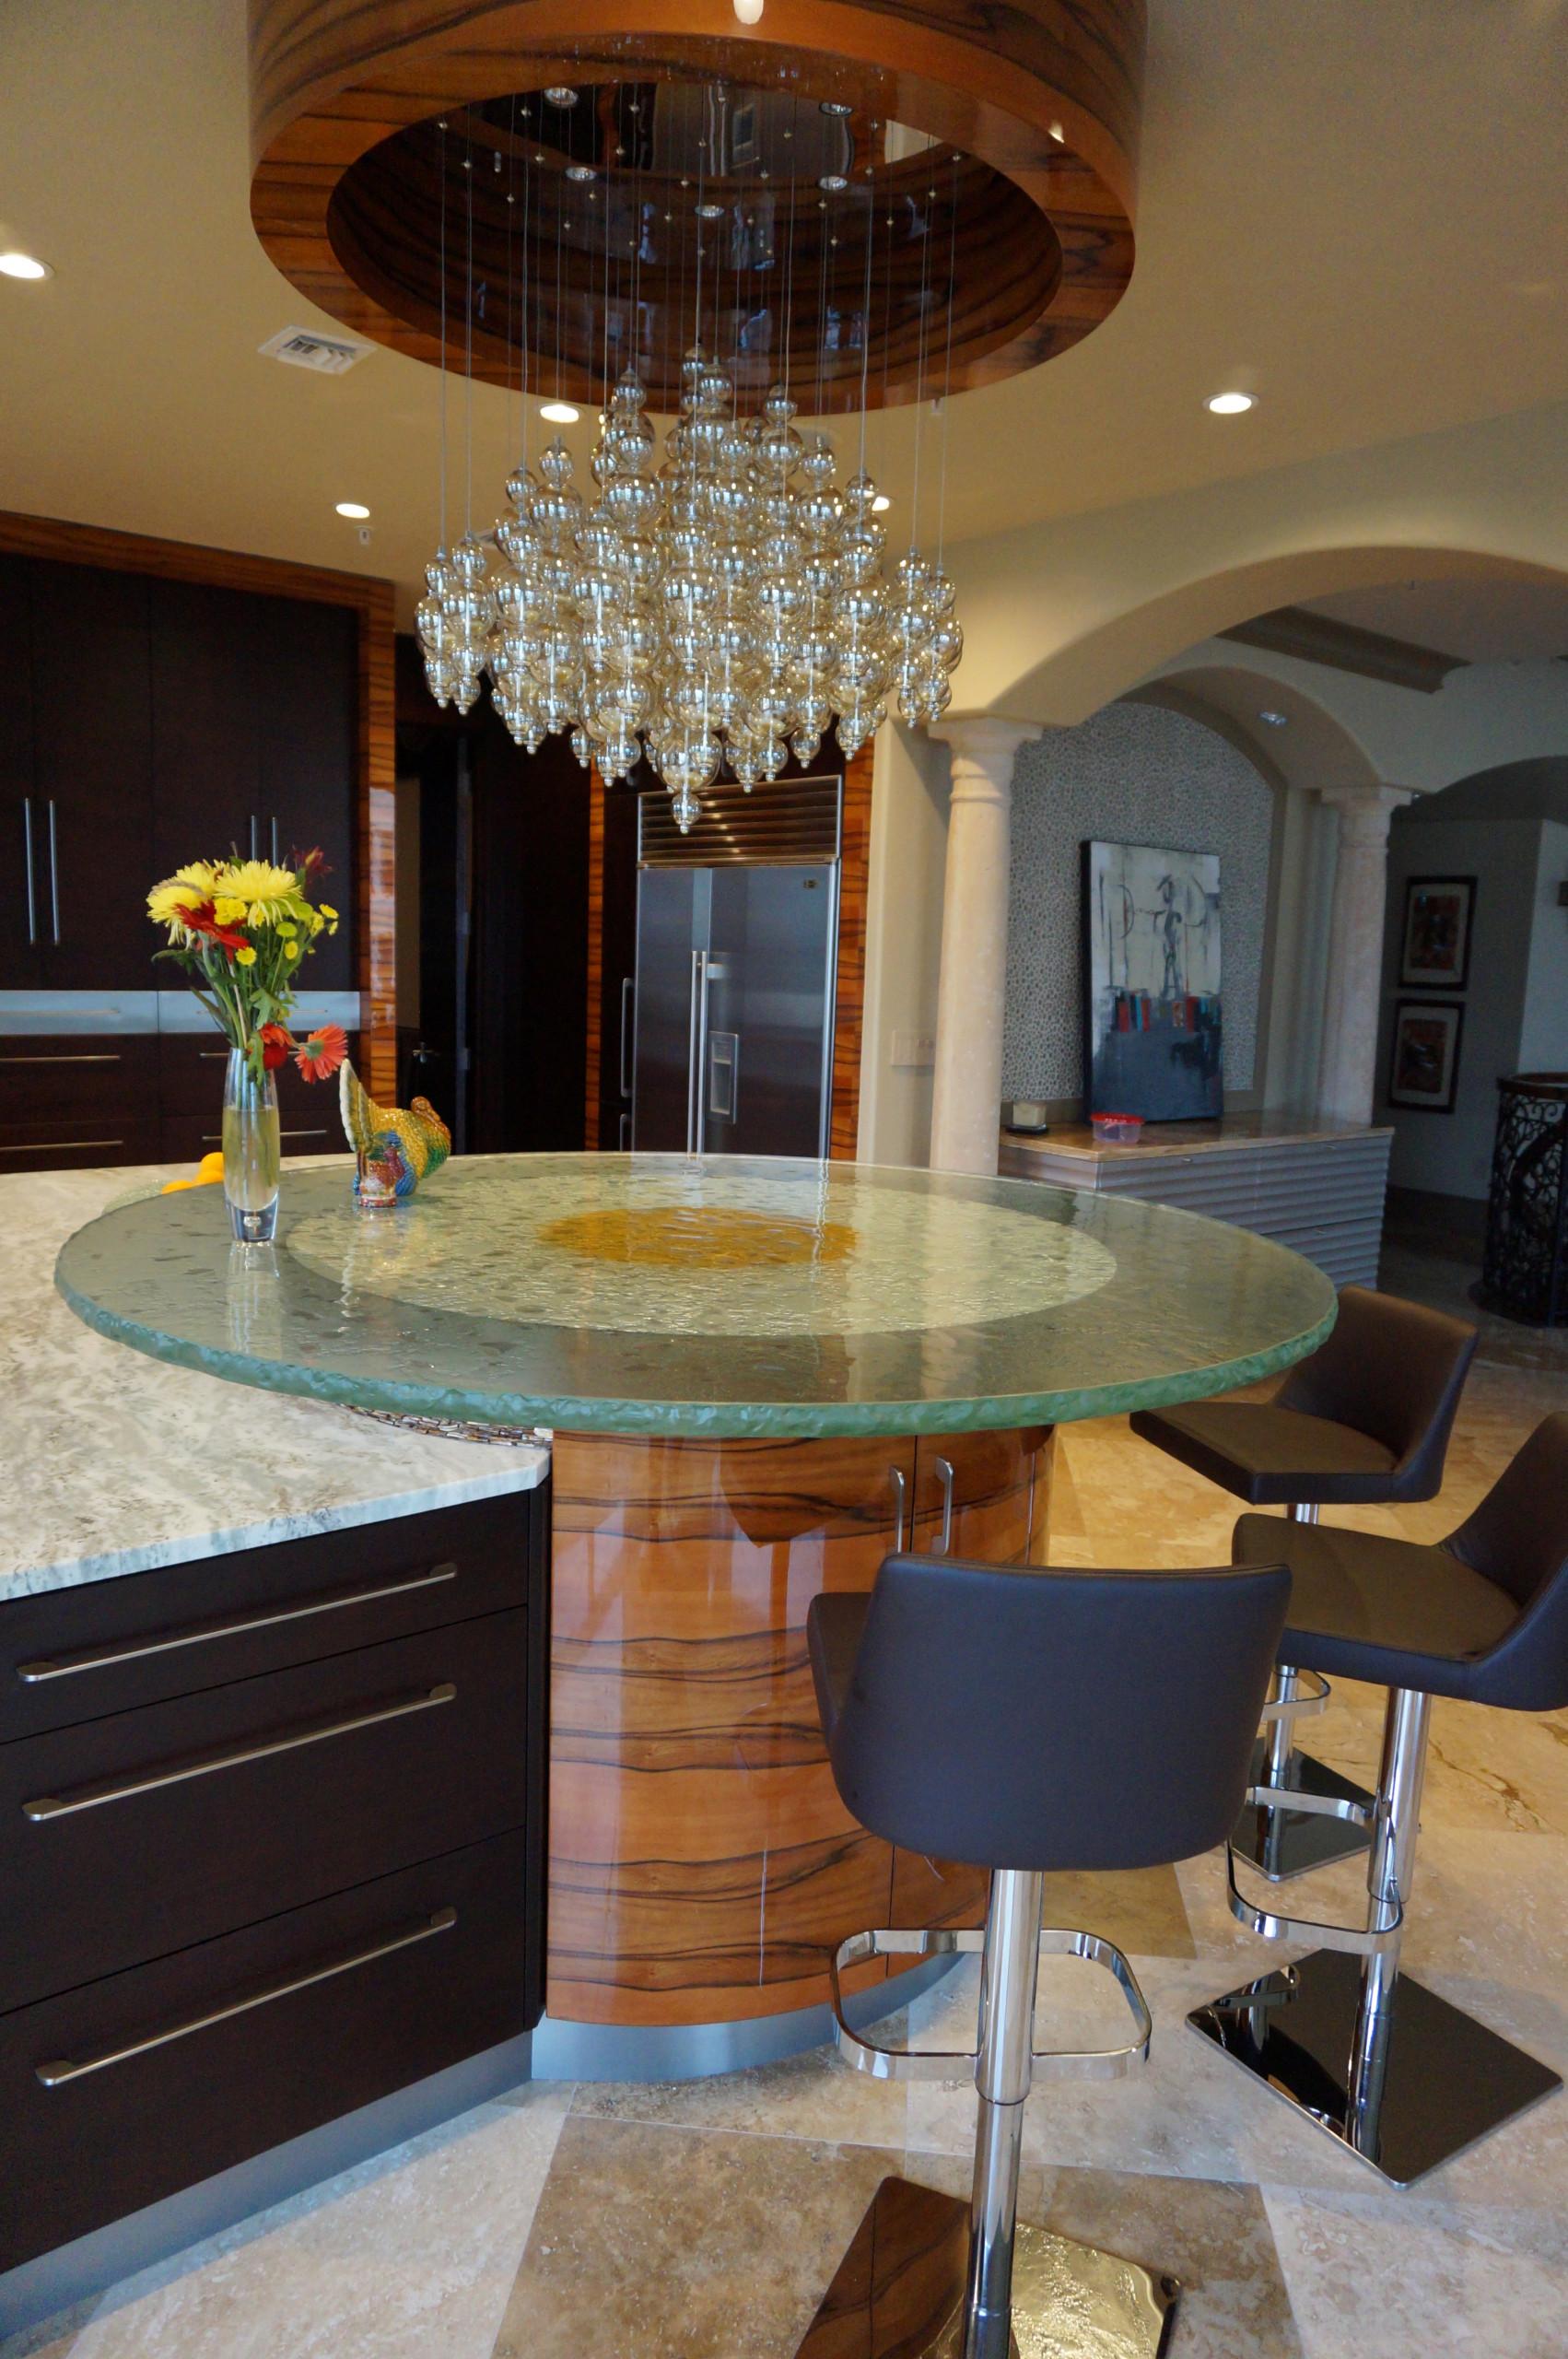 Lofty Kitchen